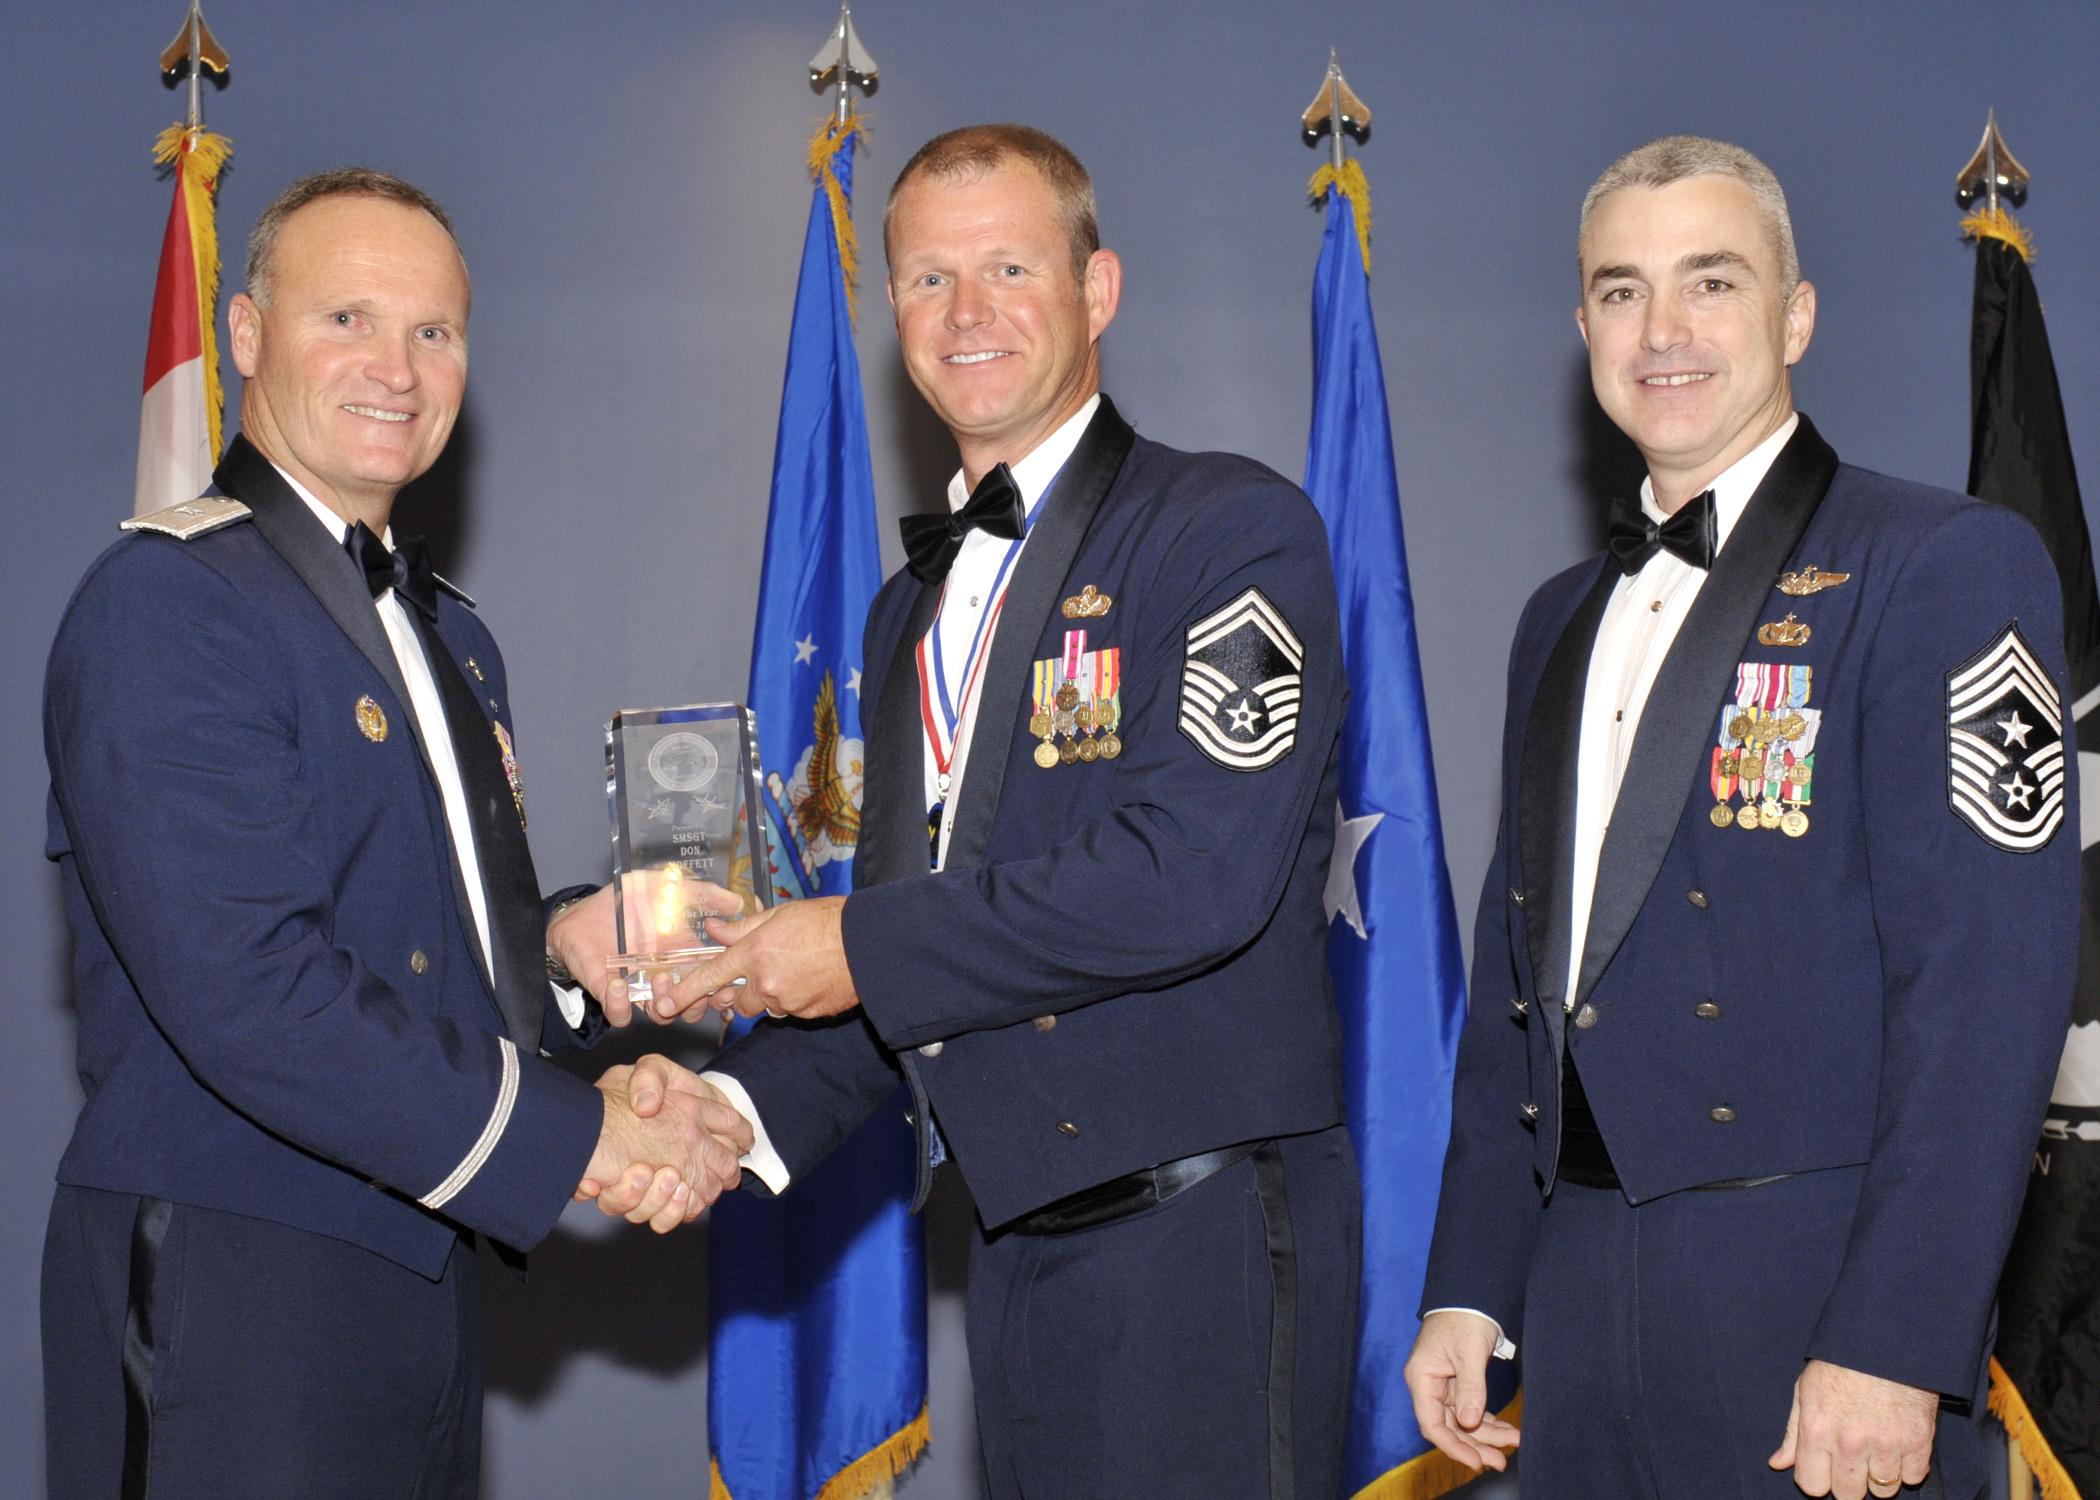 Tyndall Annual Award winners > Tyndall Air Force Base